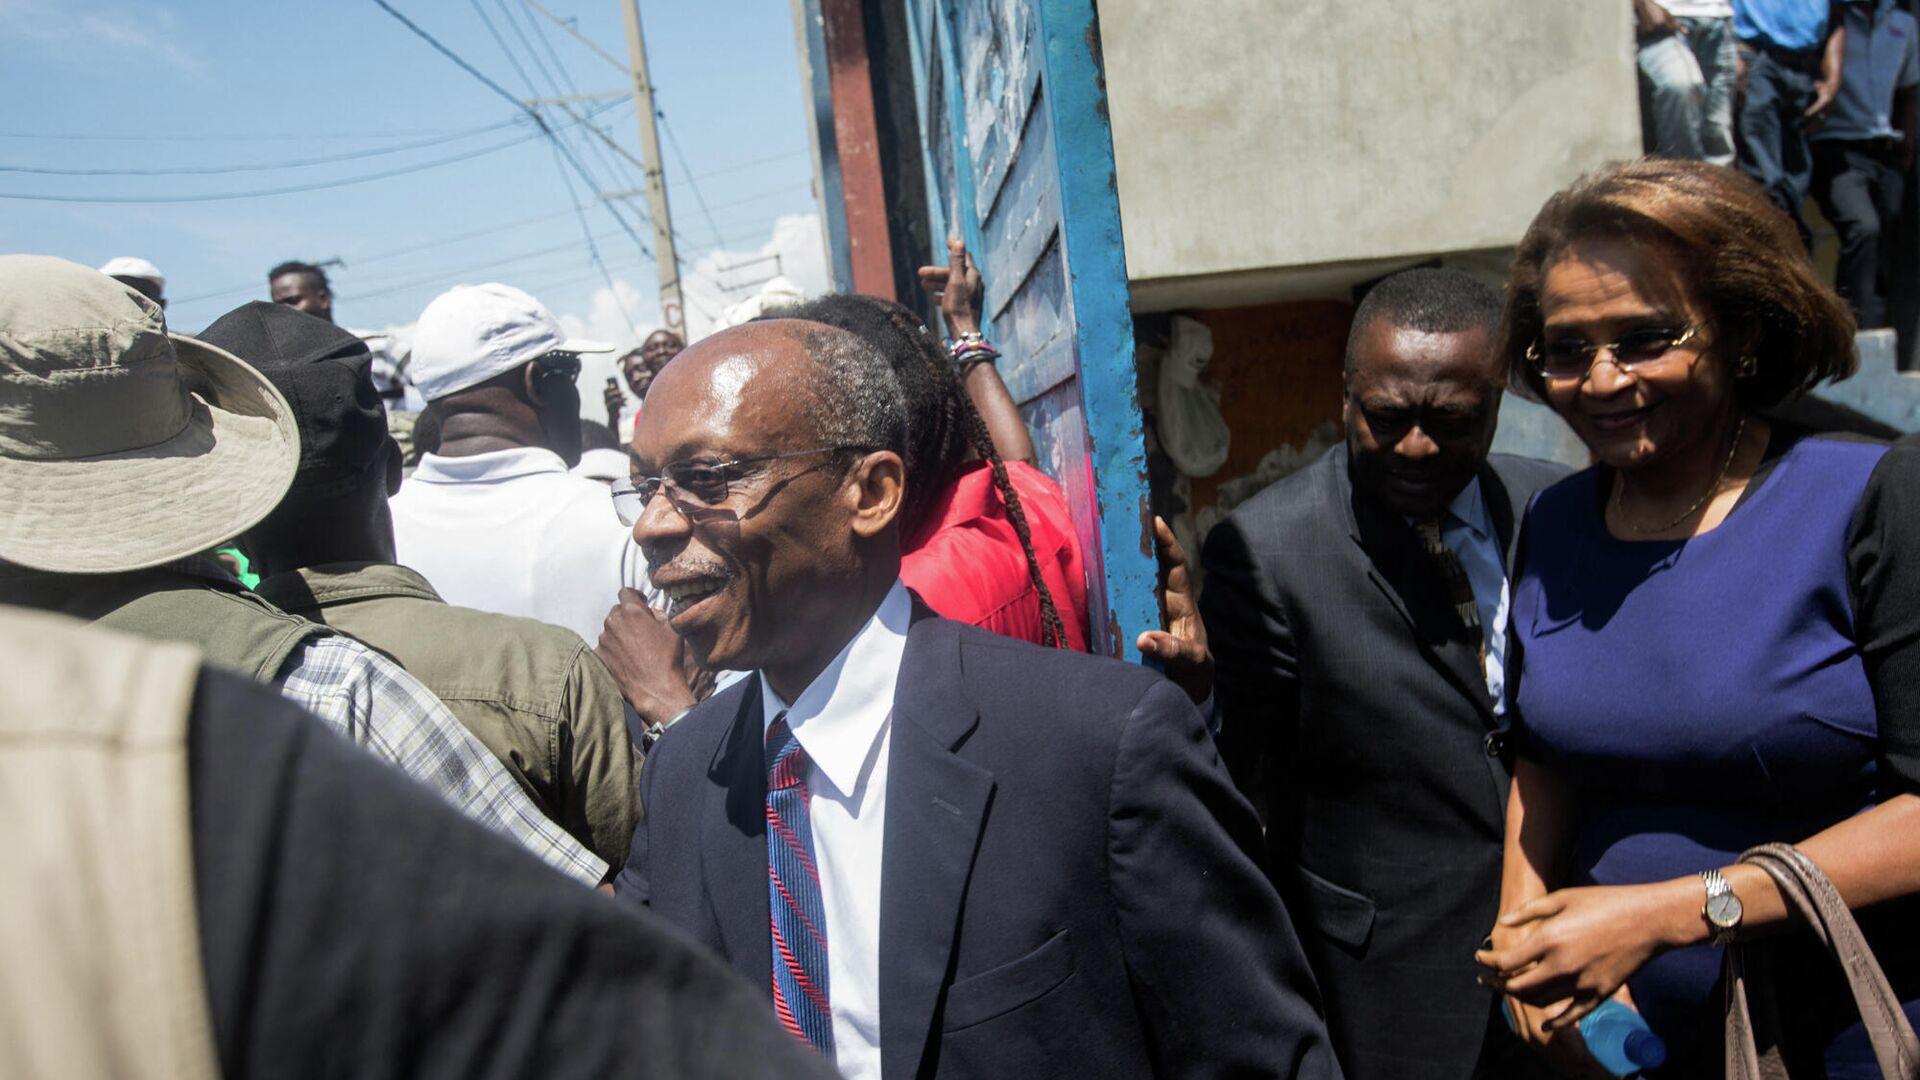 Jean Bertrand Aristide, expresidente de Haití - Sputnik Mundo, 1920, 16.07.2021